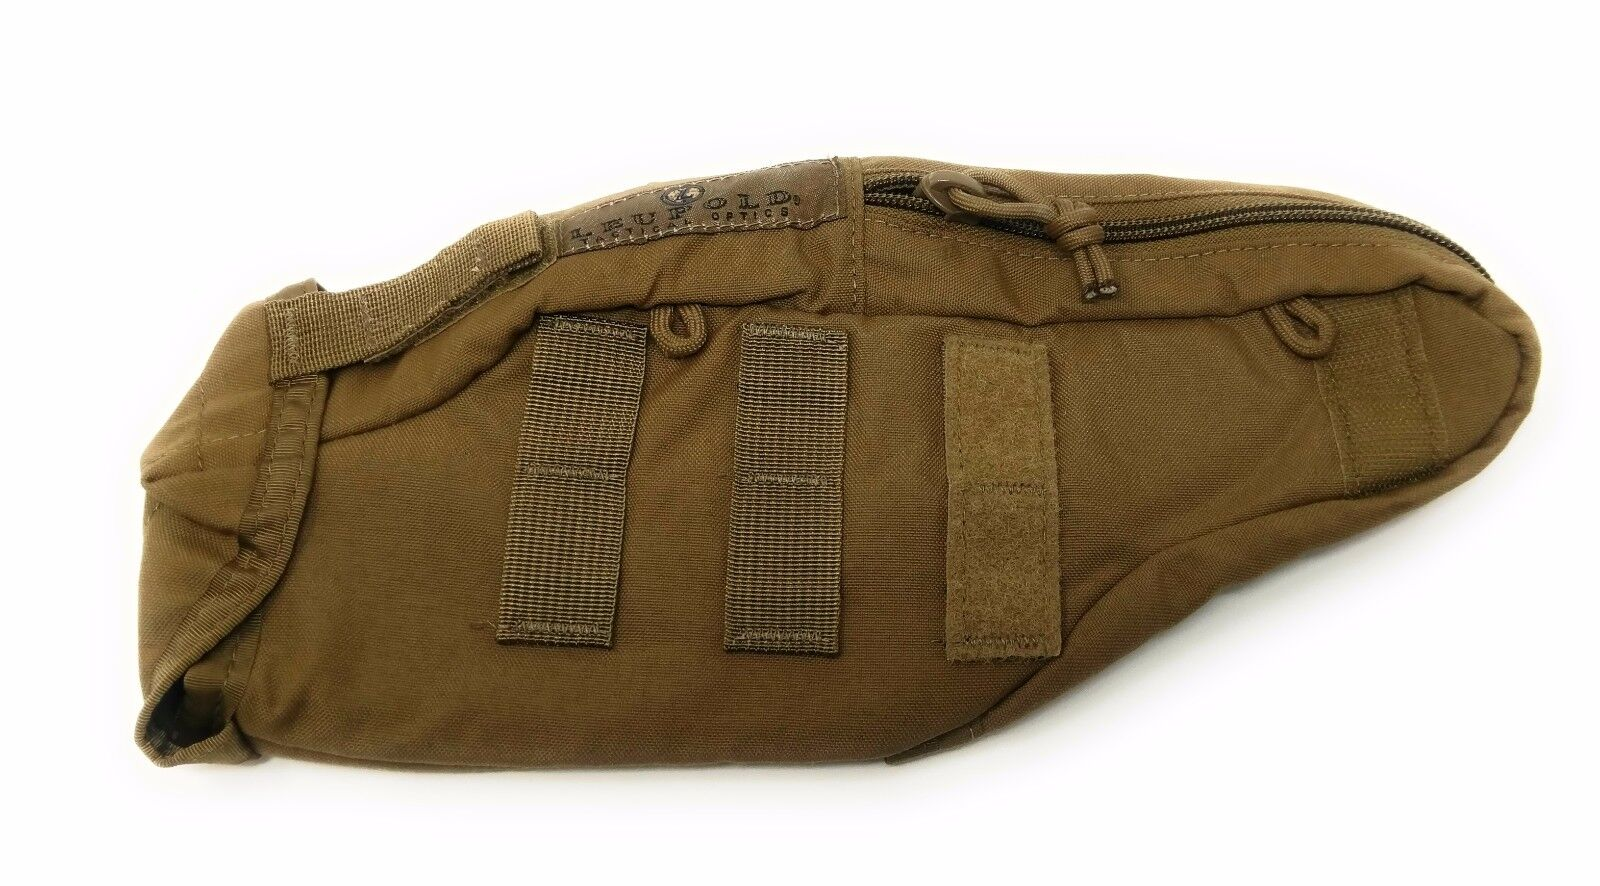 Genuine Leupold 12-40x60mm Mark 4 Spotting Scope Soft Case